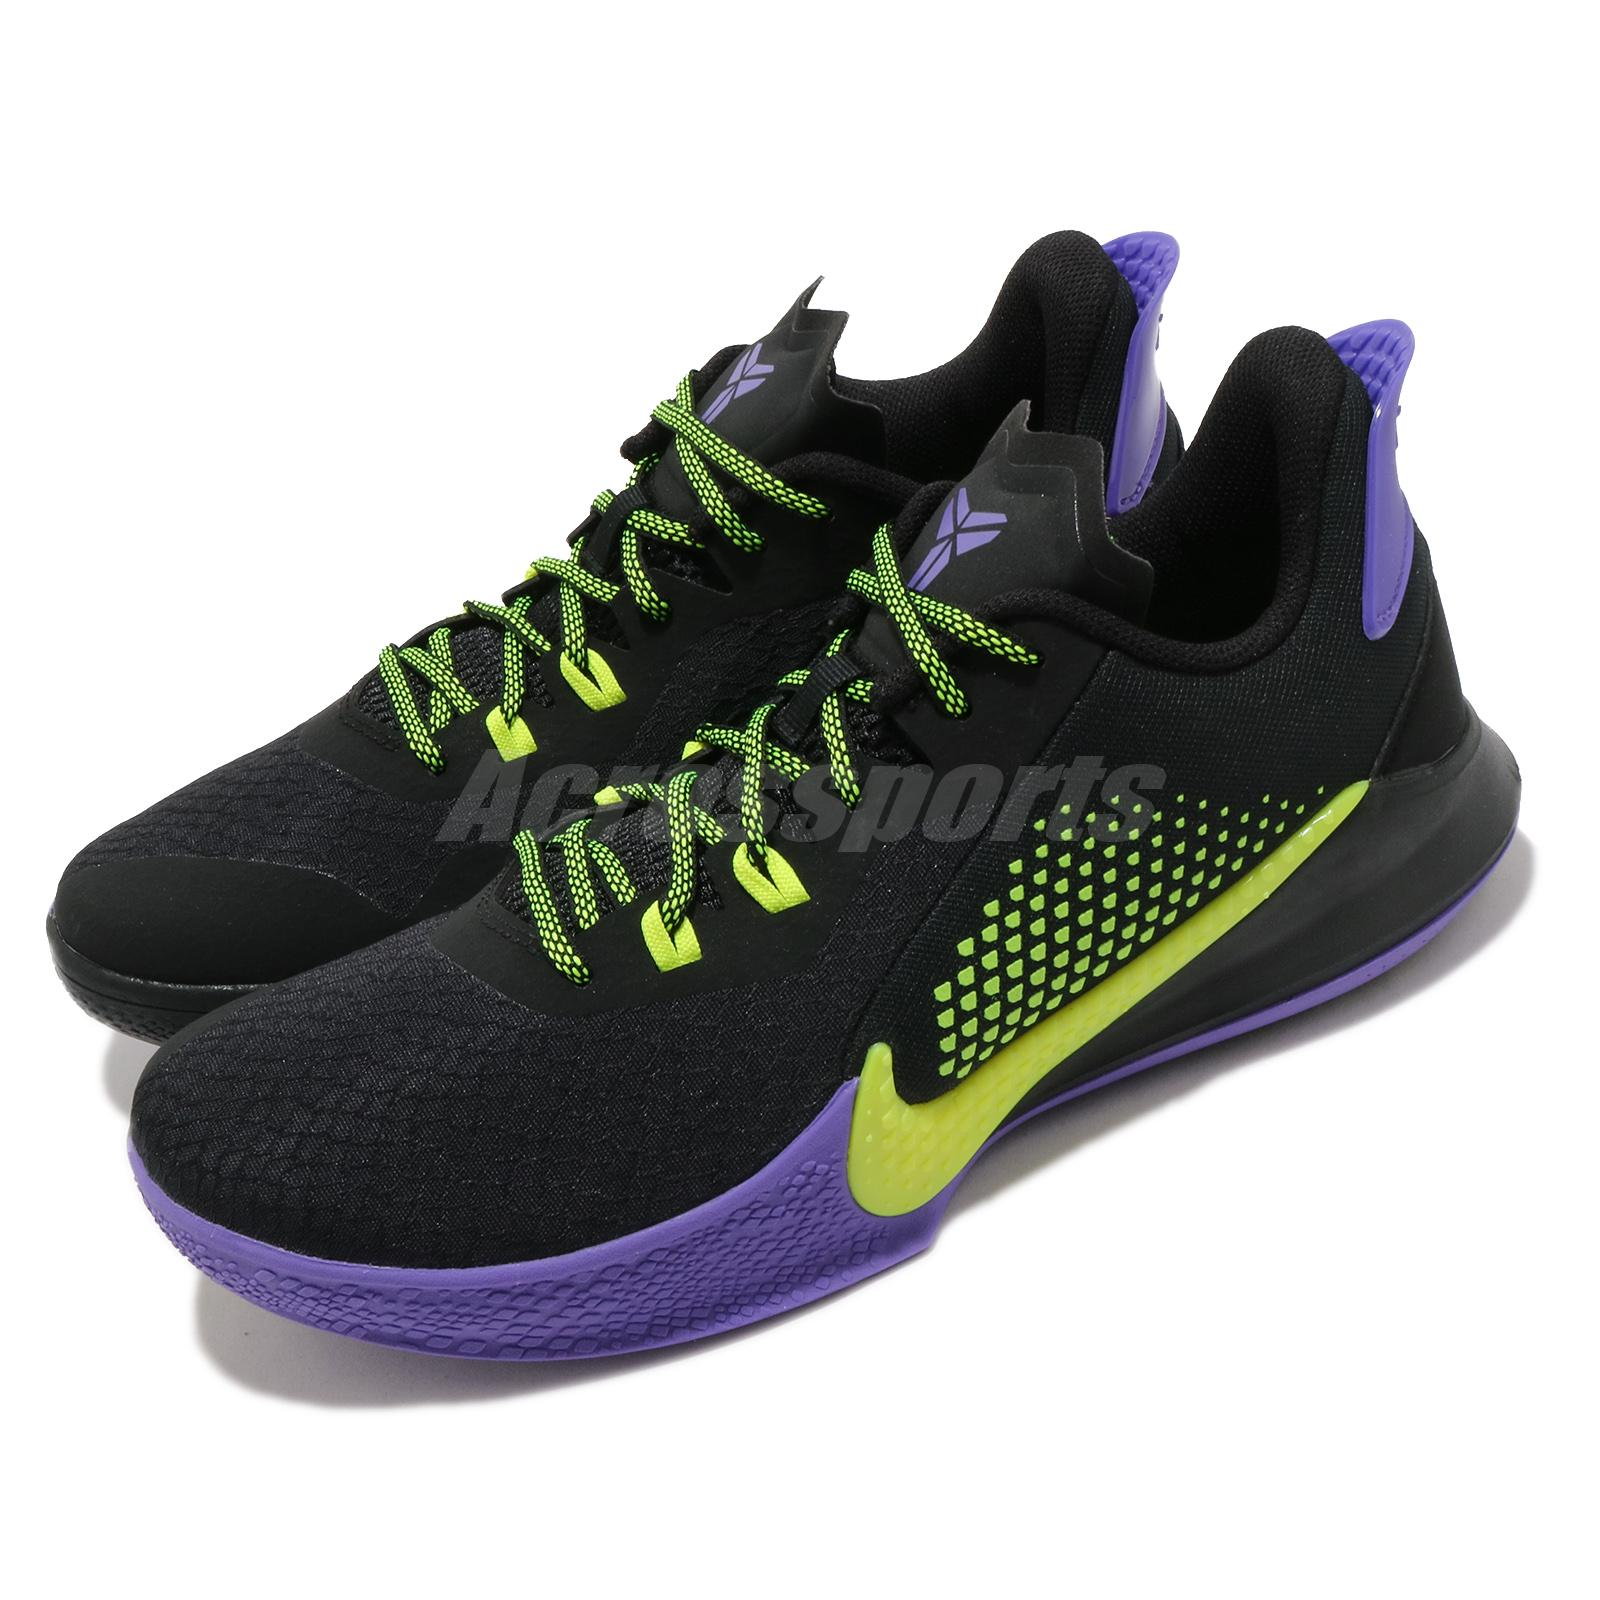 Nike Mamba Fury EP Joker Lakers Away